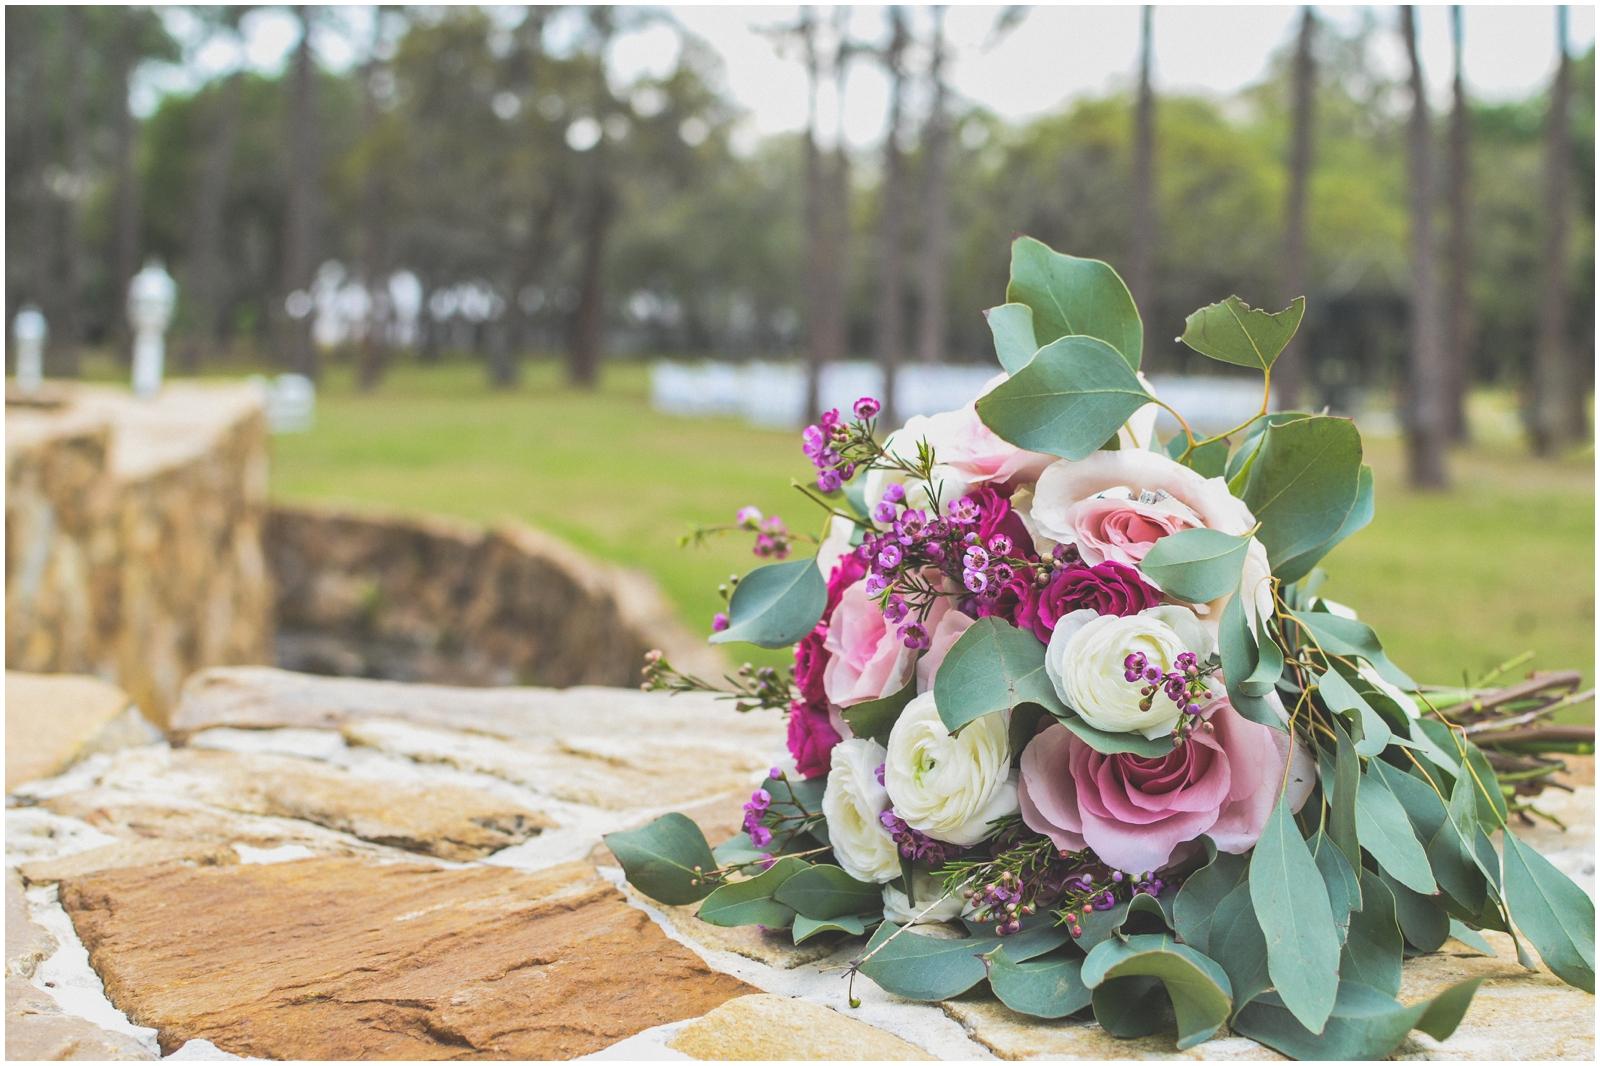 Rustic-Elegant-Wedding-Venue-in-Tampa-Stonebridge-Events_0437.jpg